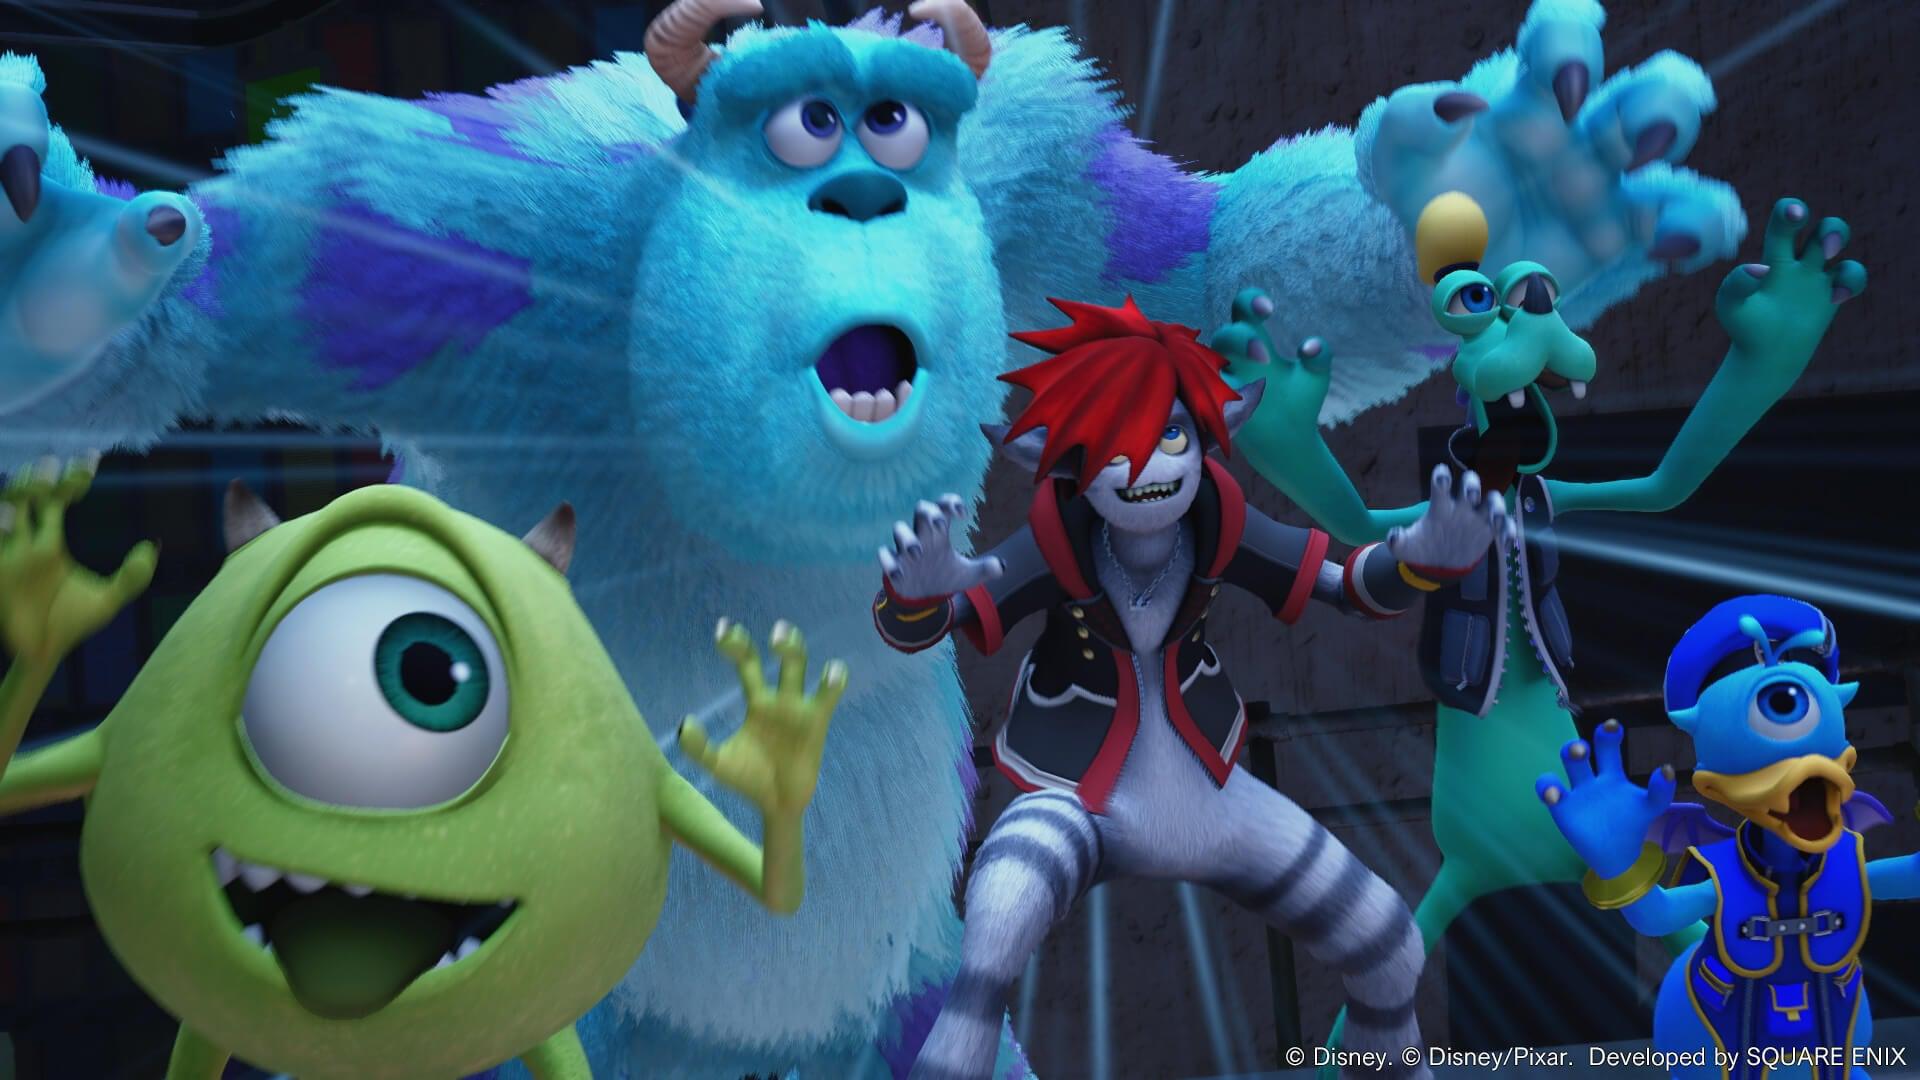 © Disney. © Disney/Pixar. Developed by SQUARE ENIX